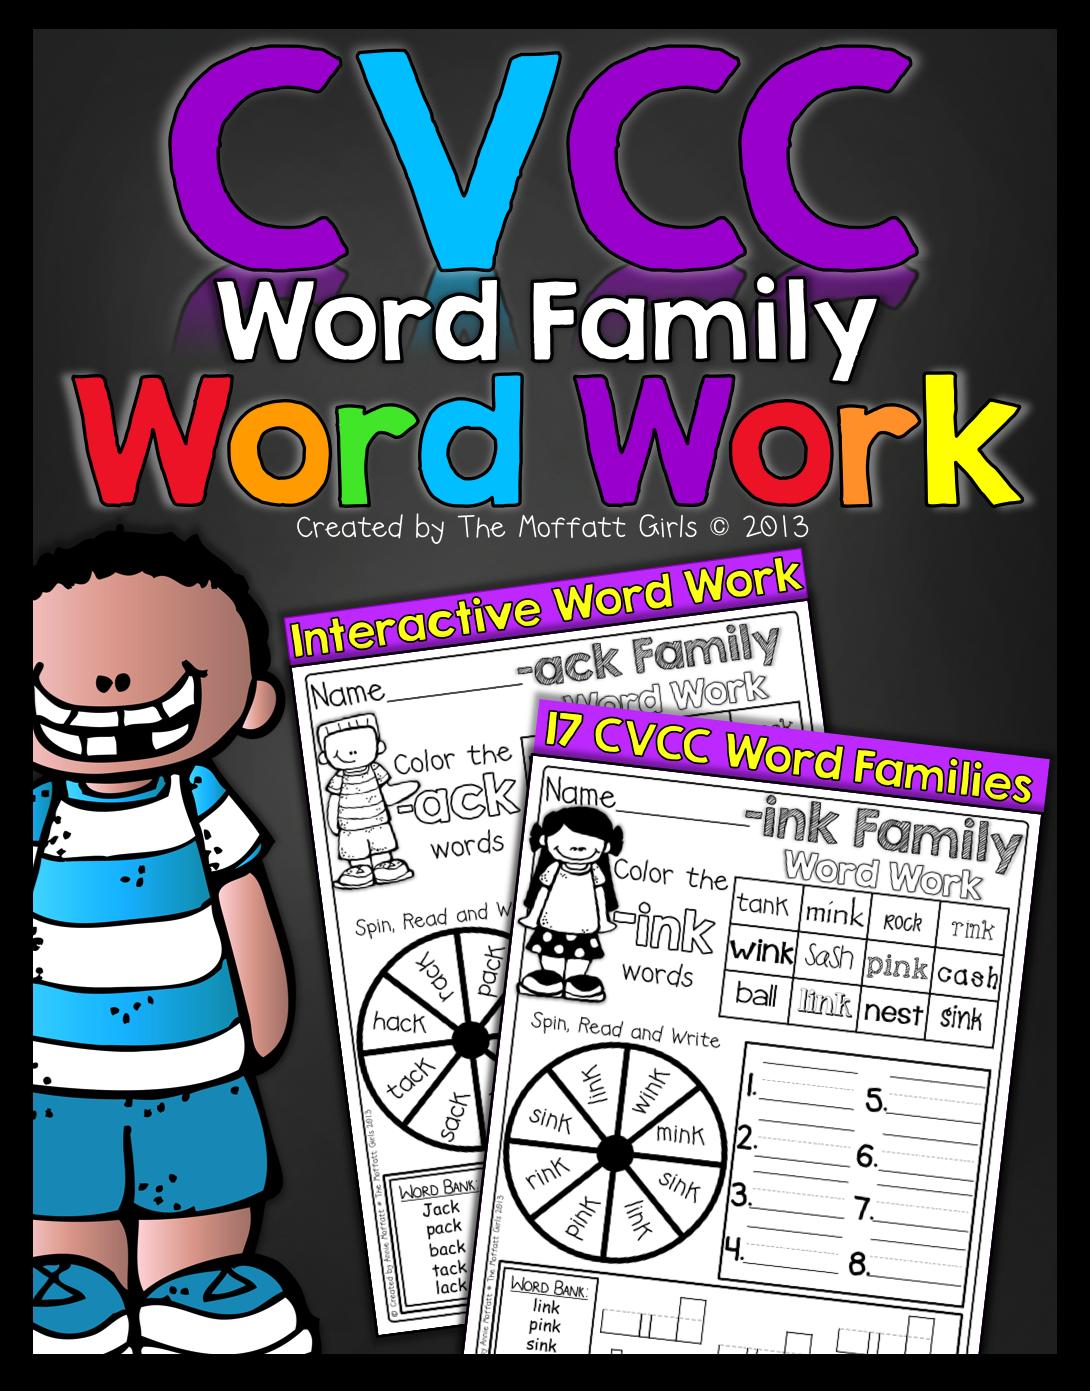 Cvcc Word Family Word Work